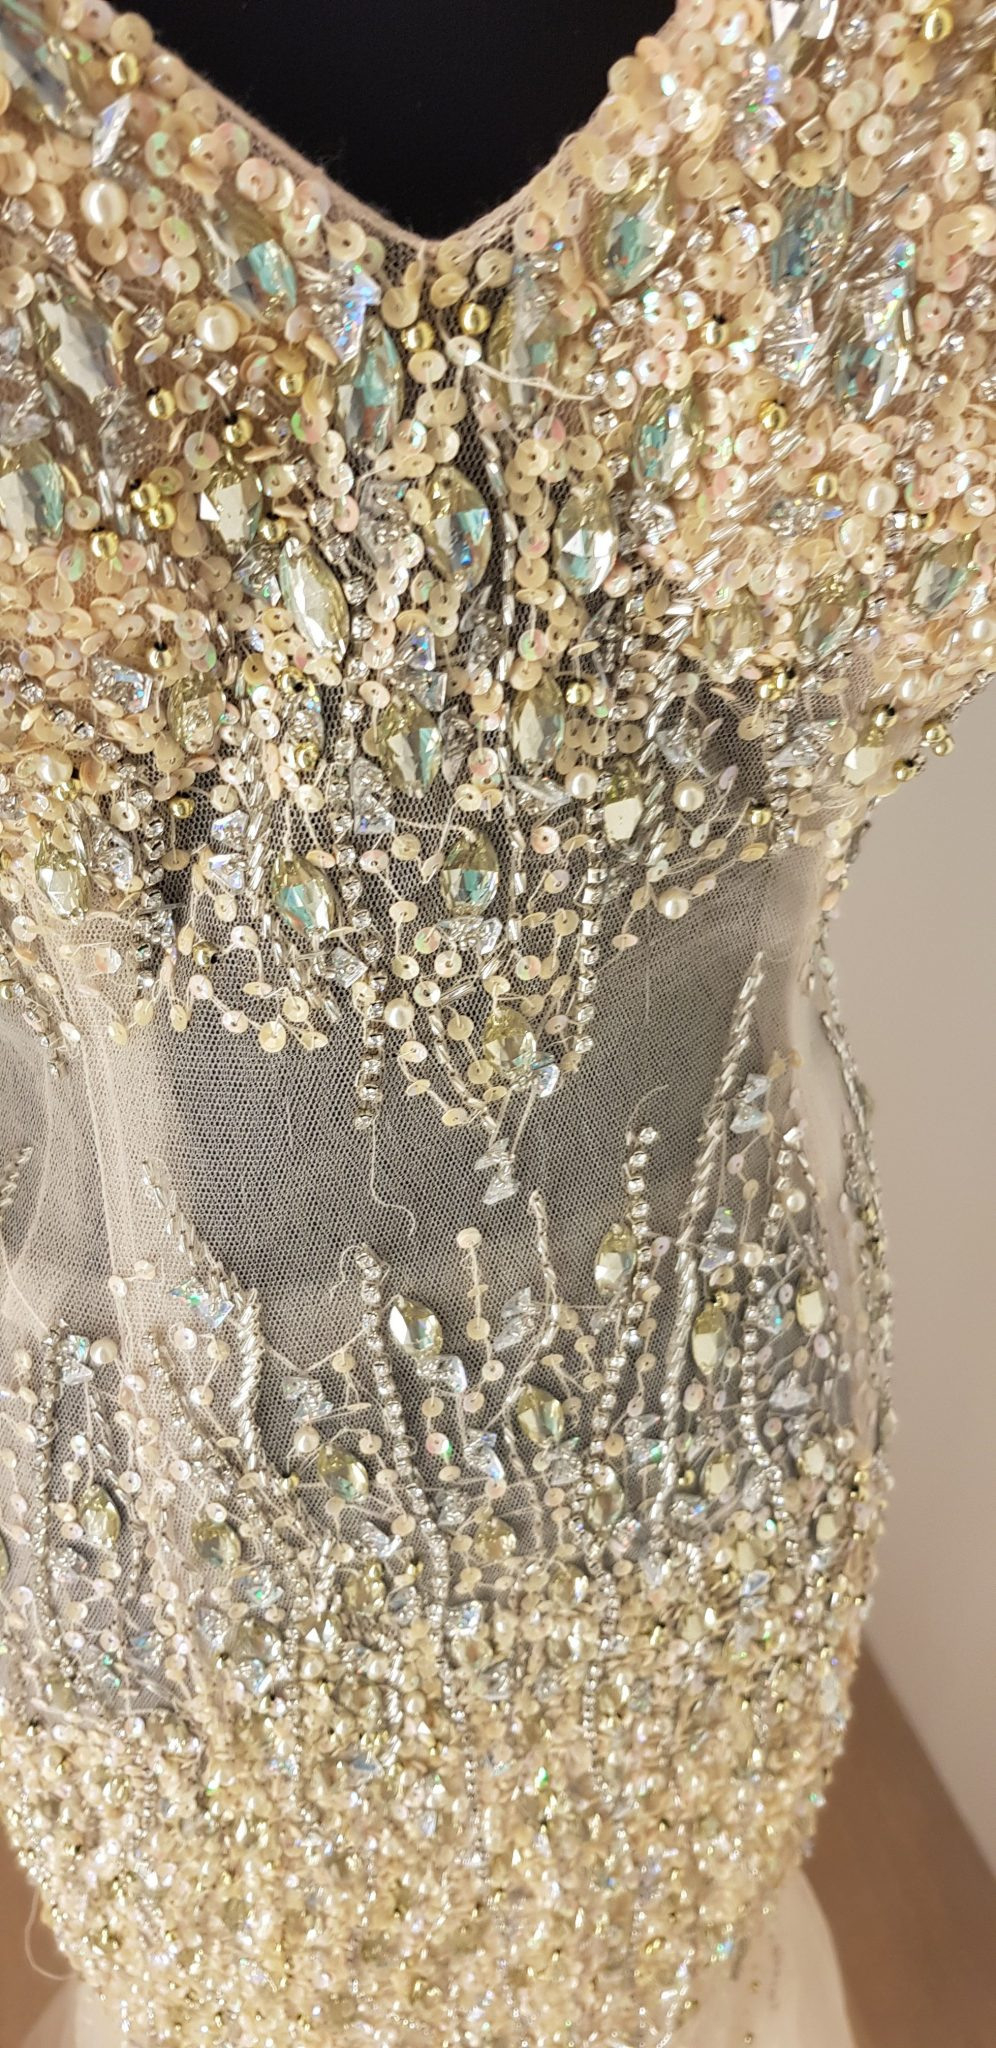 20 Wunderbar Terani Couture Abendkleid StylishDesigner Ausgezeichnet Terani Couture Abendkleid Galerie